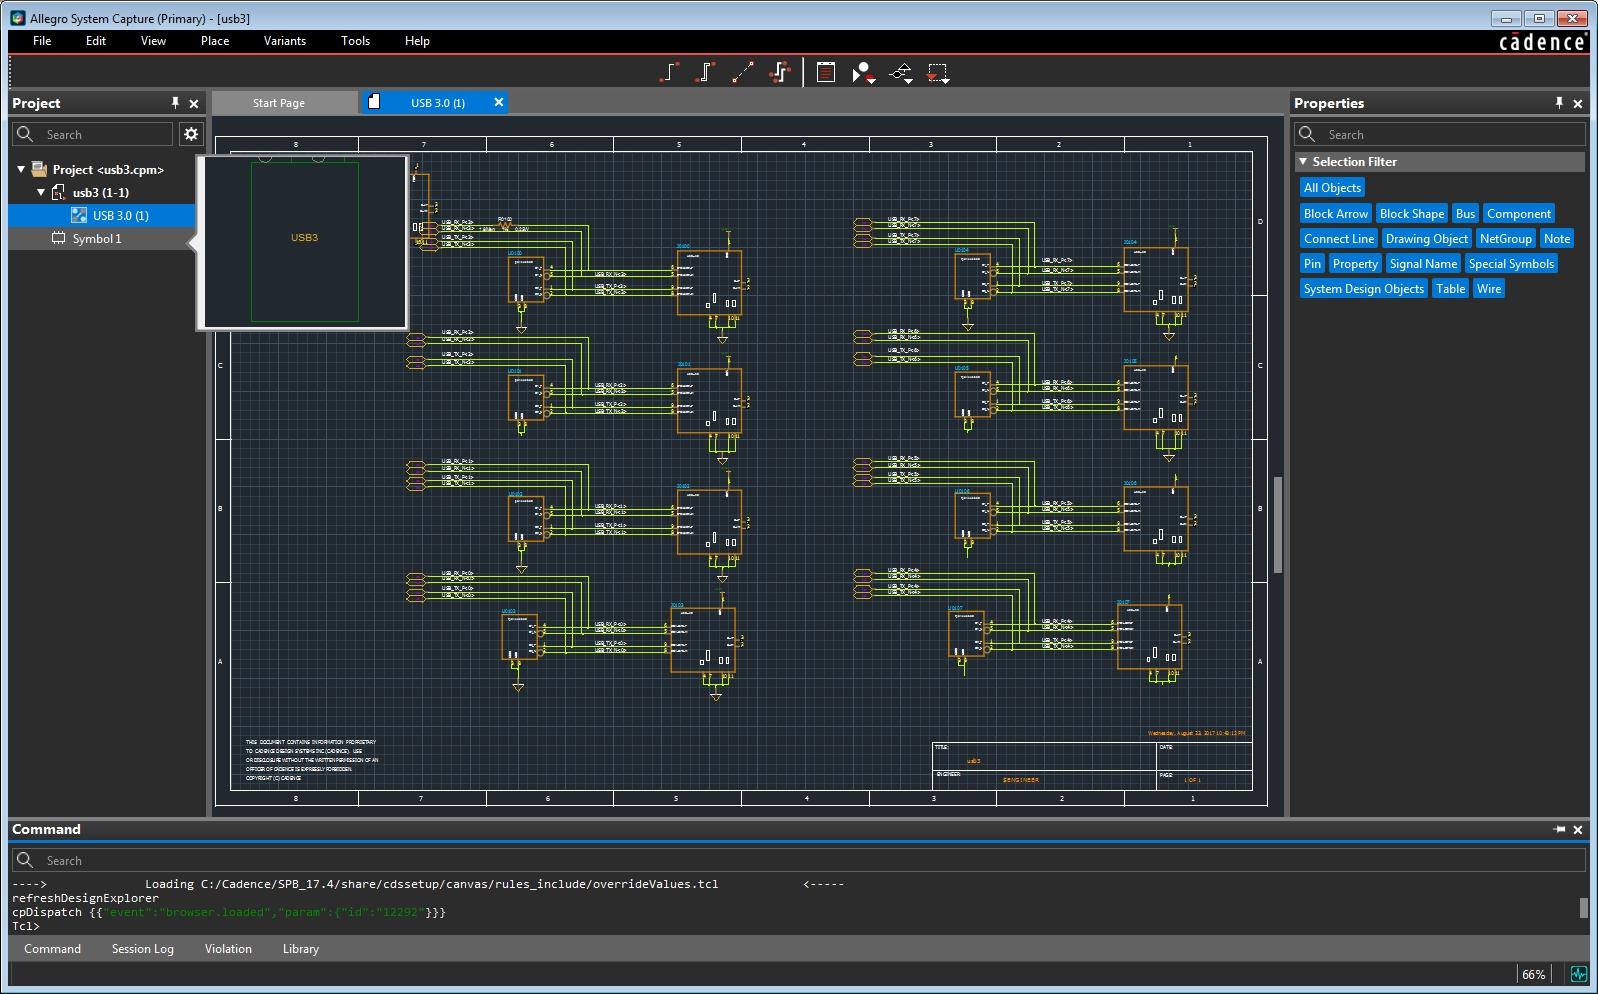 Screenshot of Cadence Allegro's System Capture software